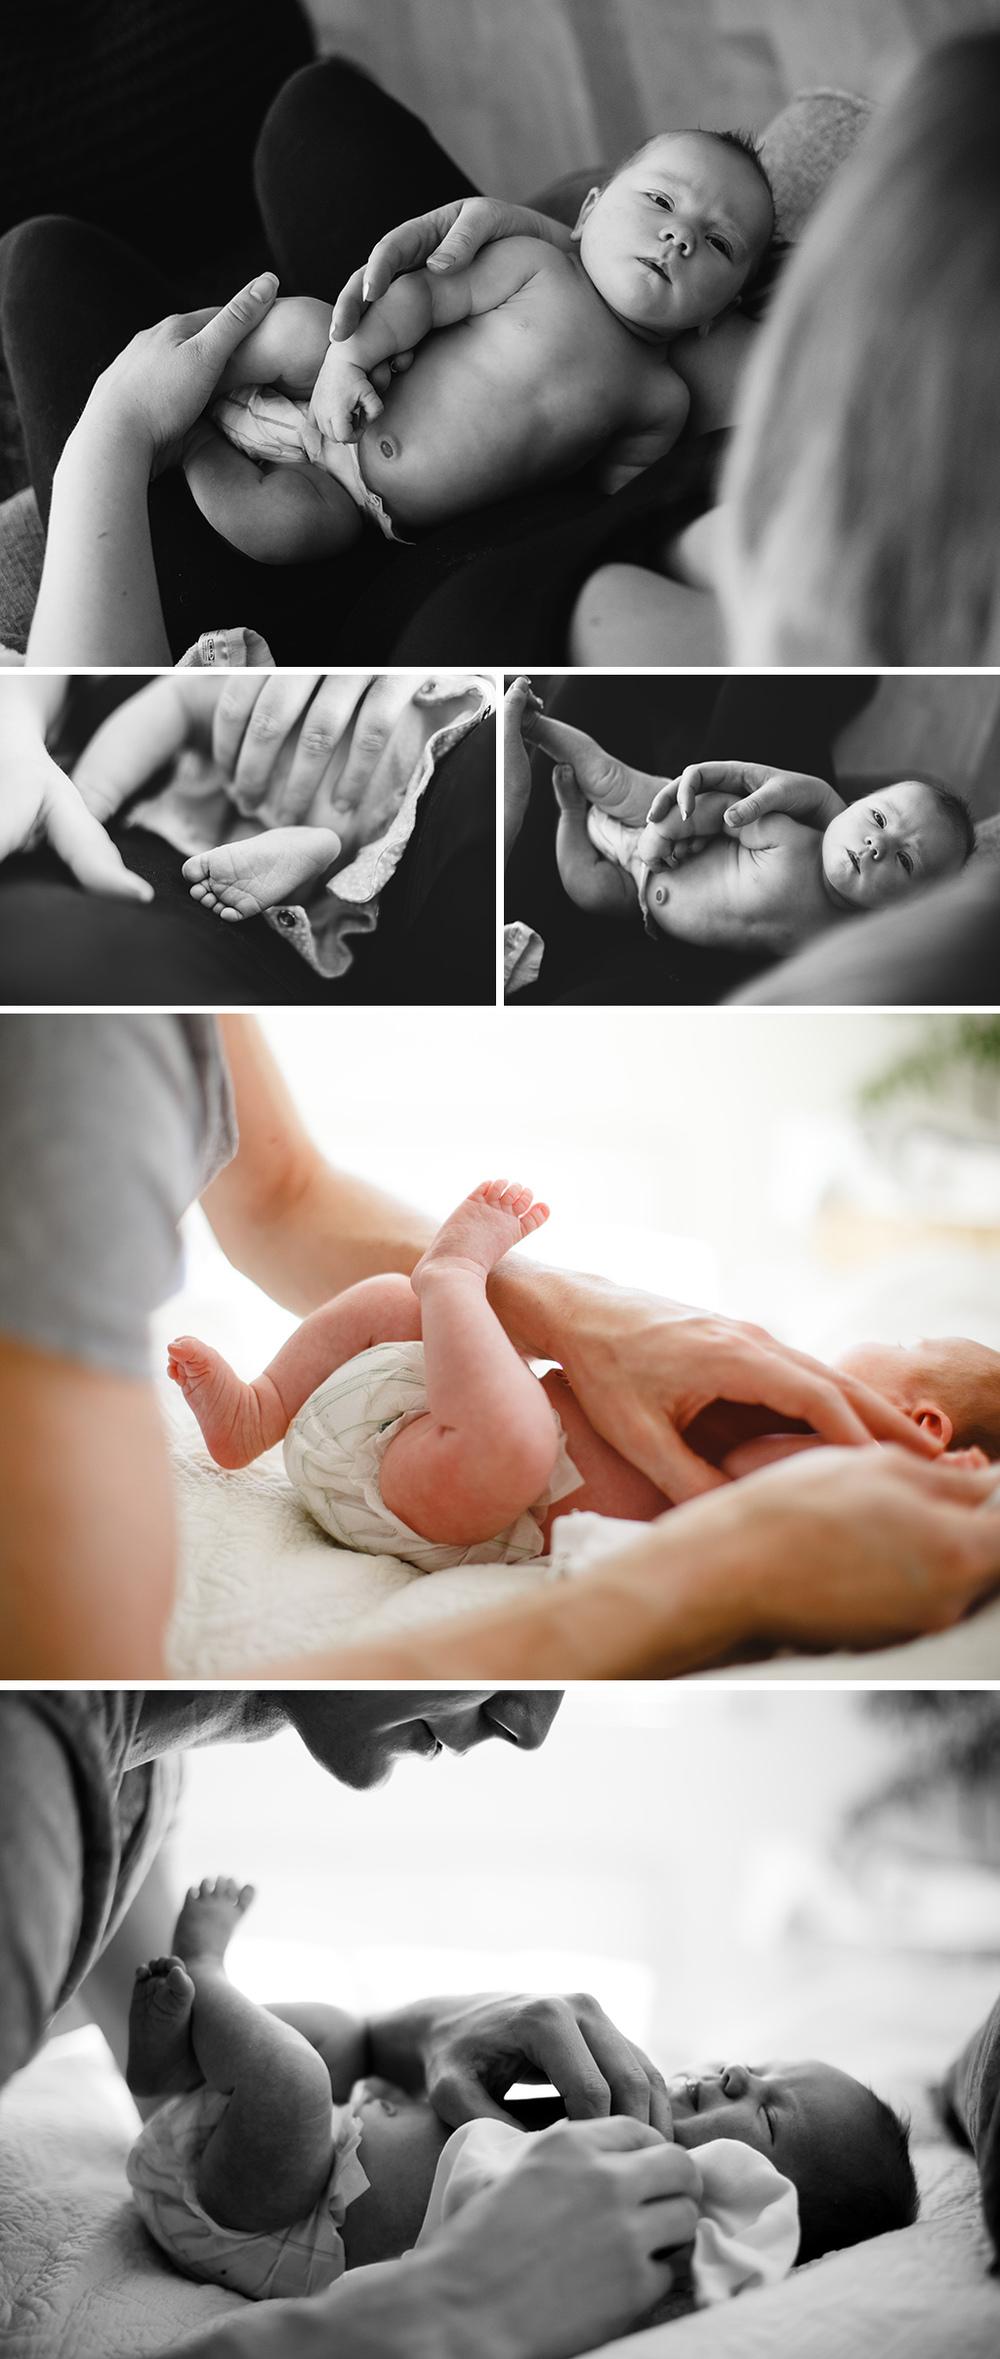 Nyfoddfotografering_newborn_familjefotograf_hemma-hosfotografering-5.jpg